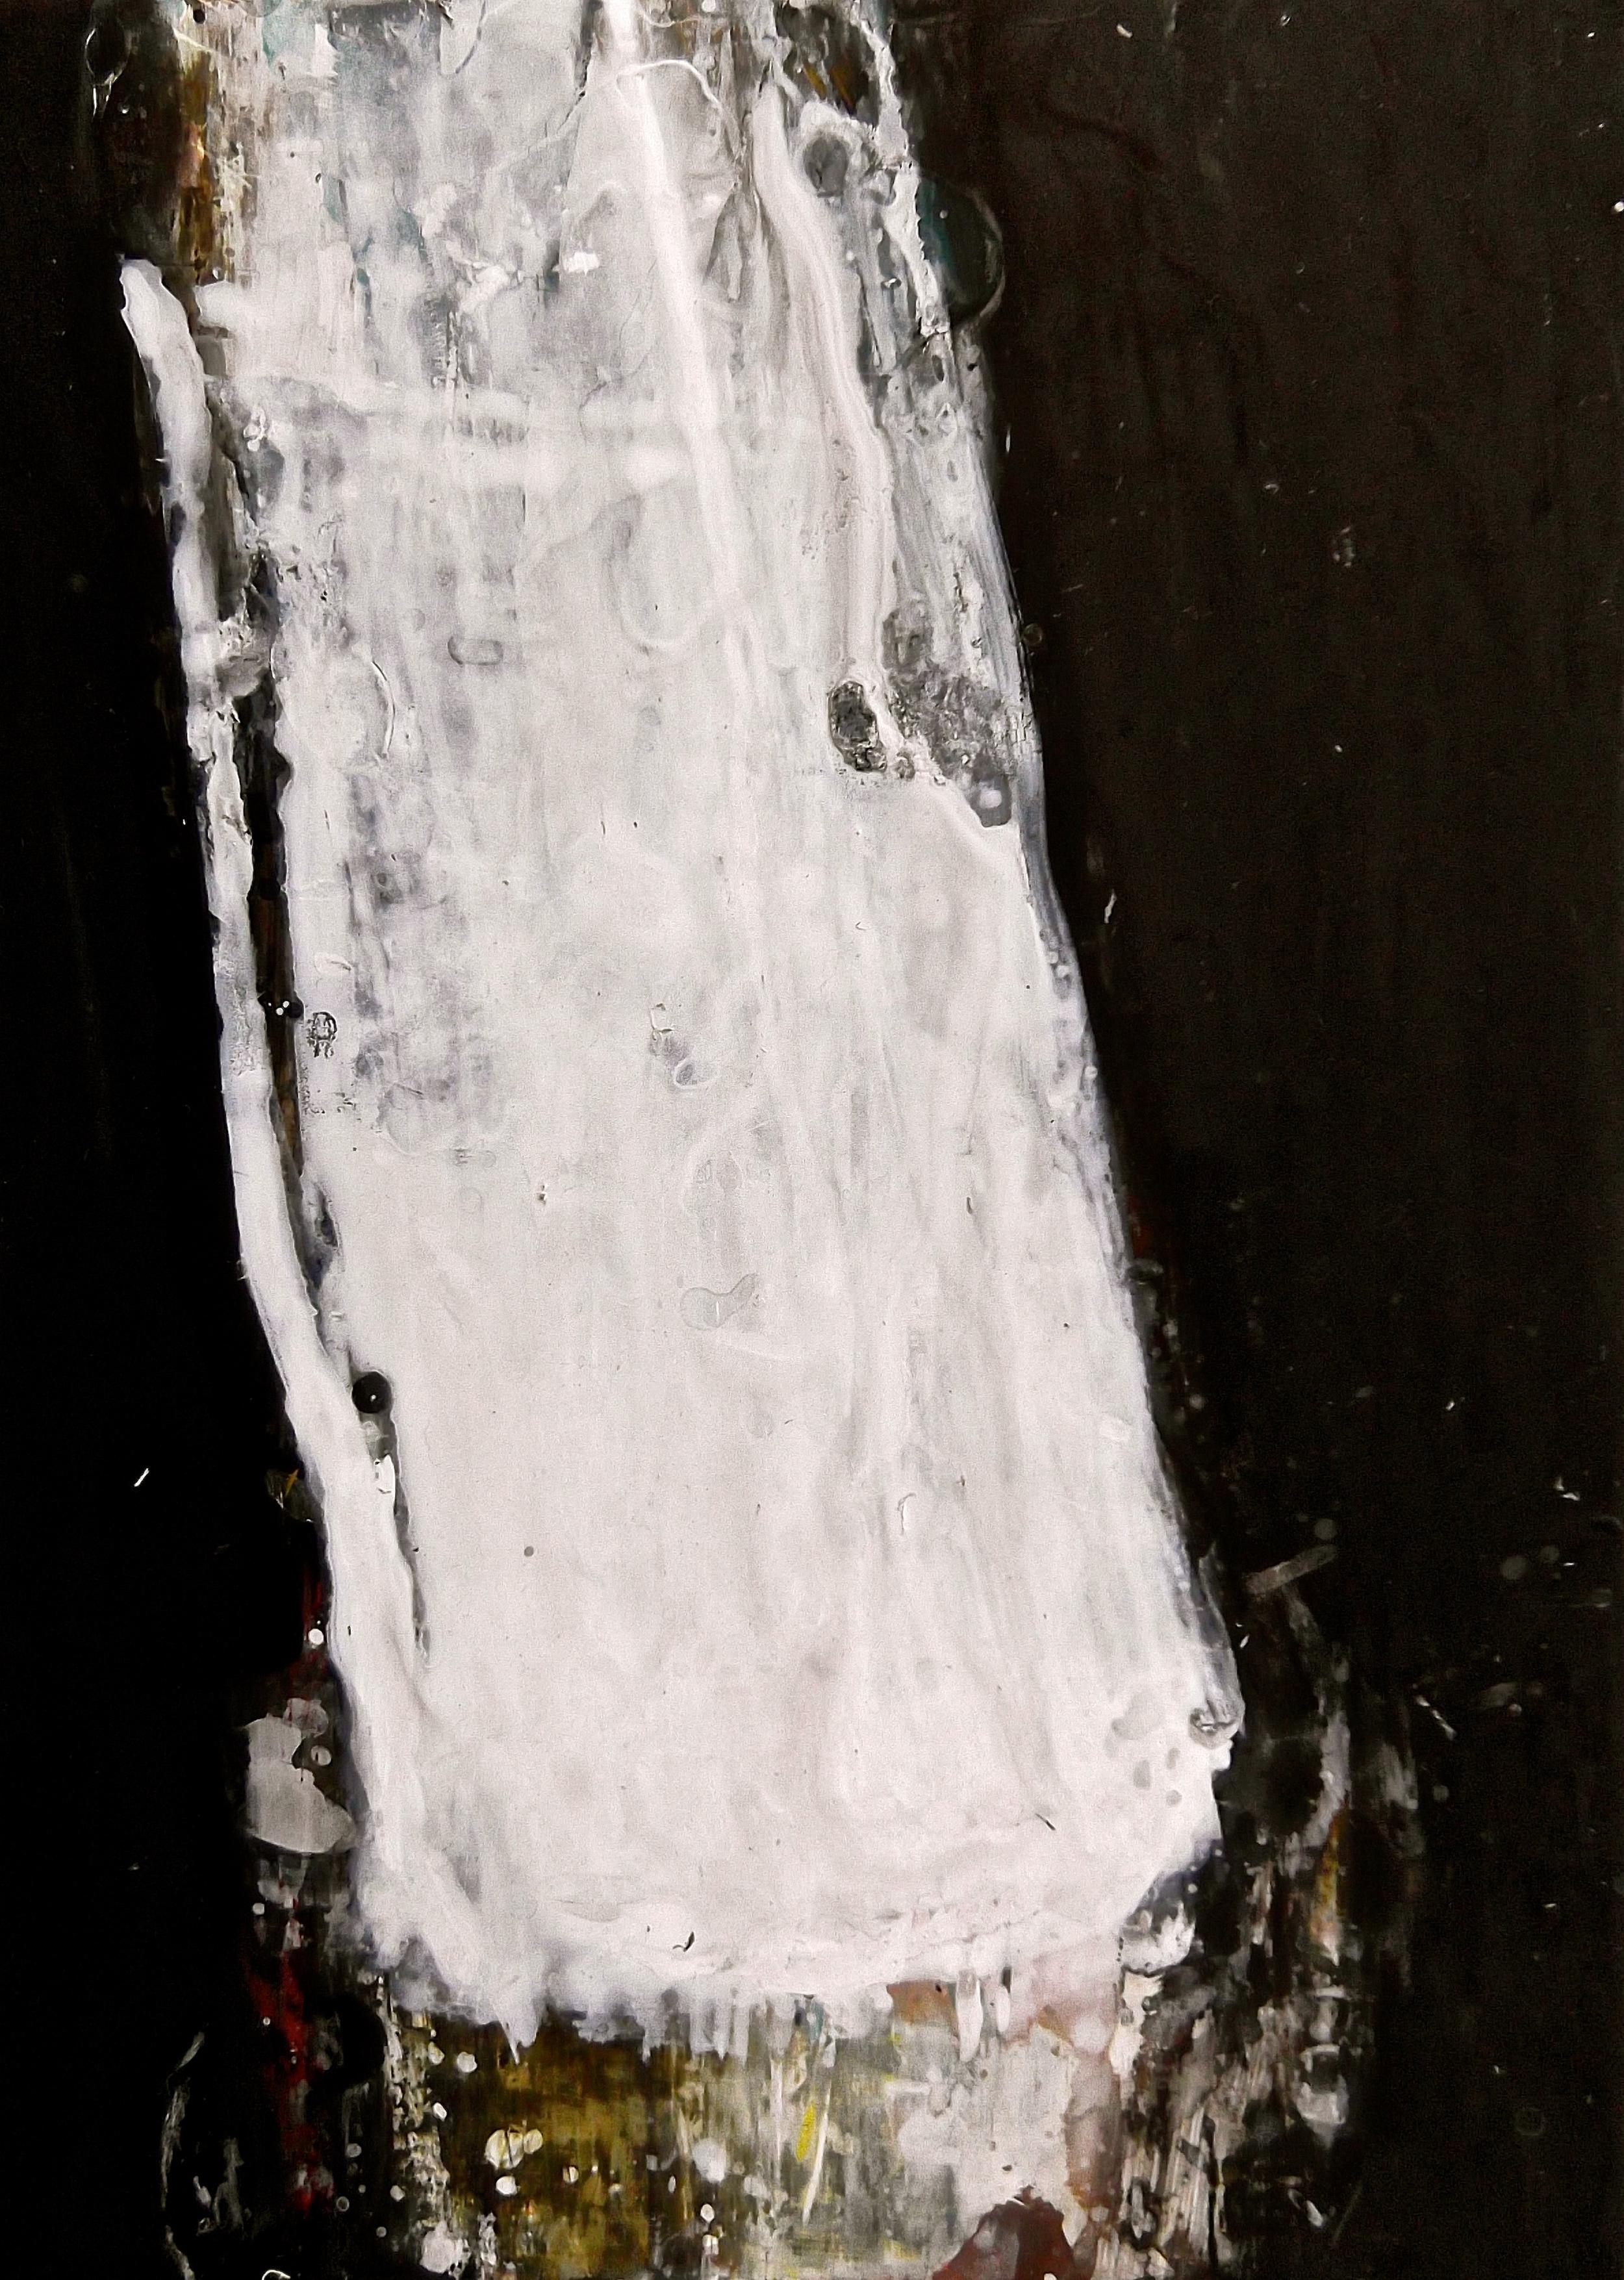 33 waterfall